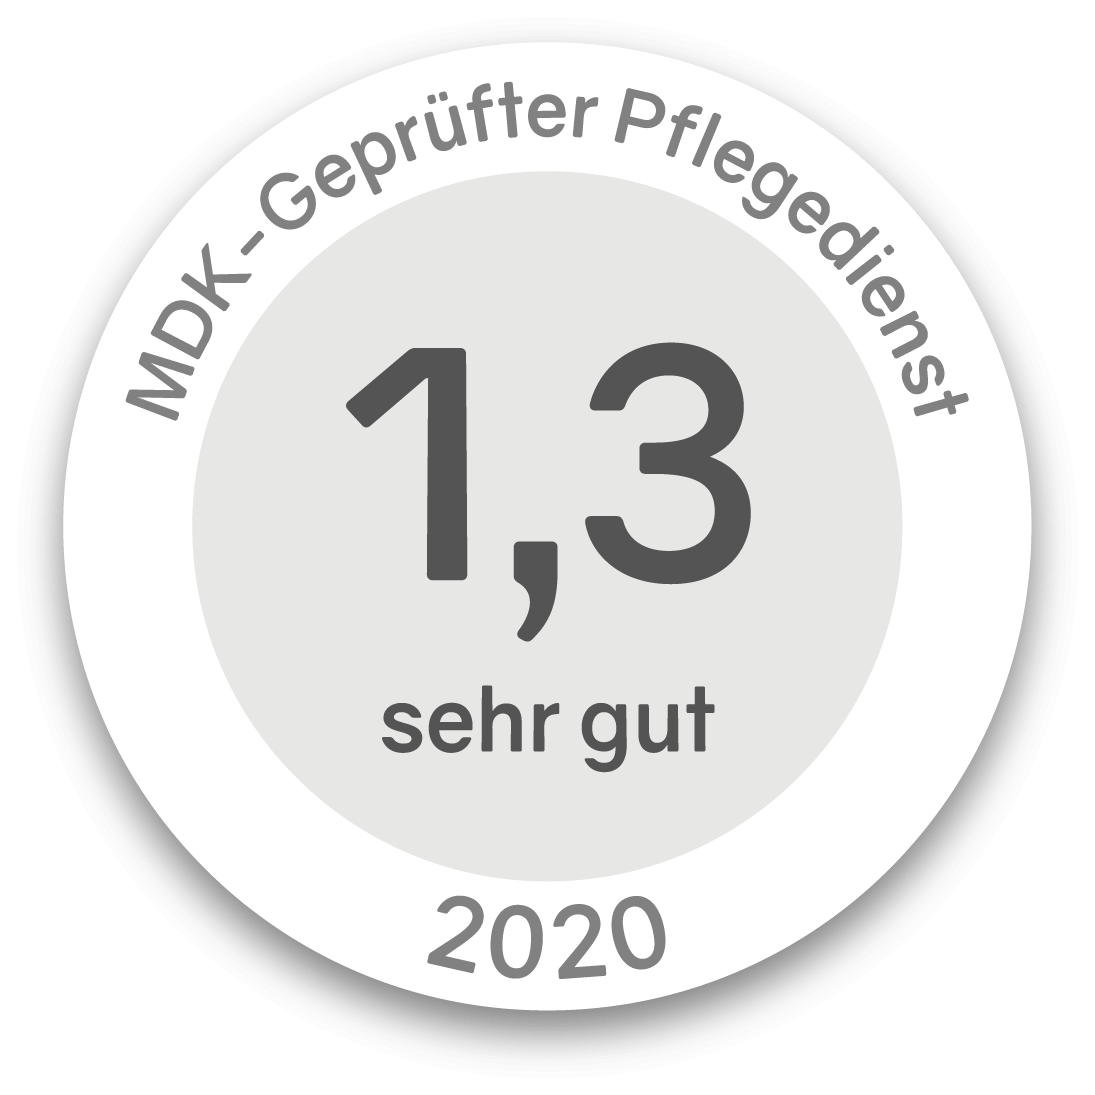 Siegel MDK-Geprüfter Pflegedienst 2020